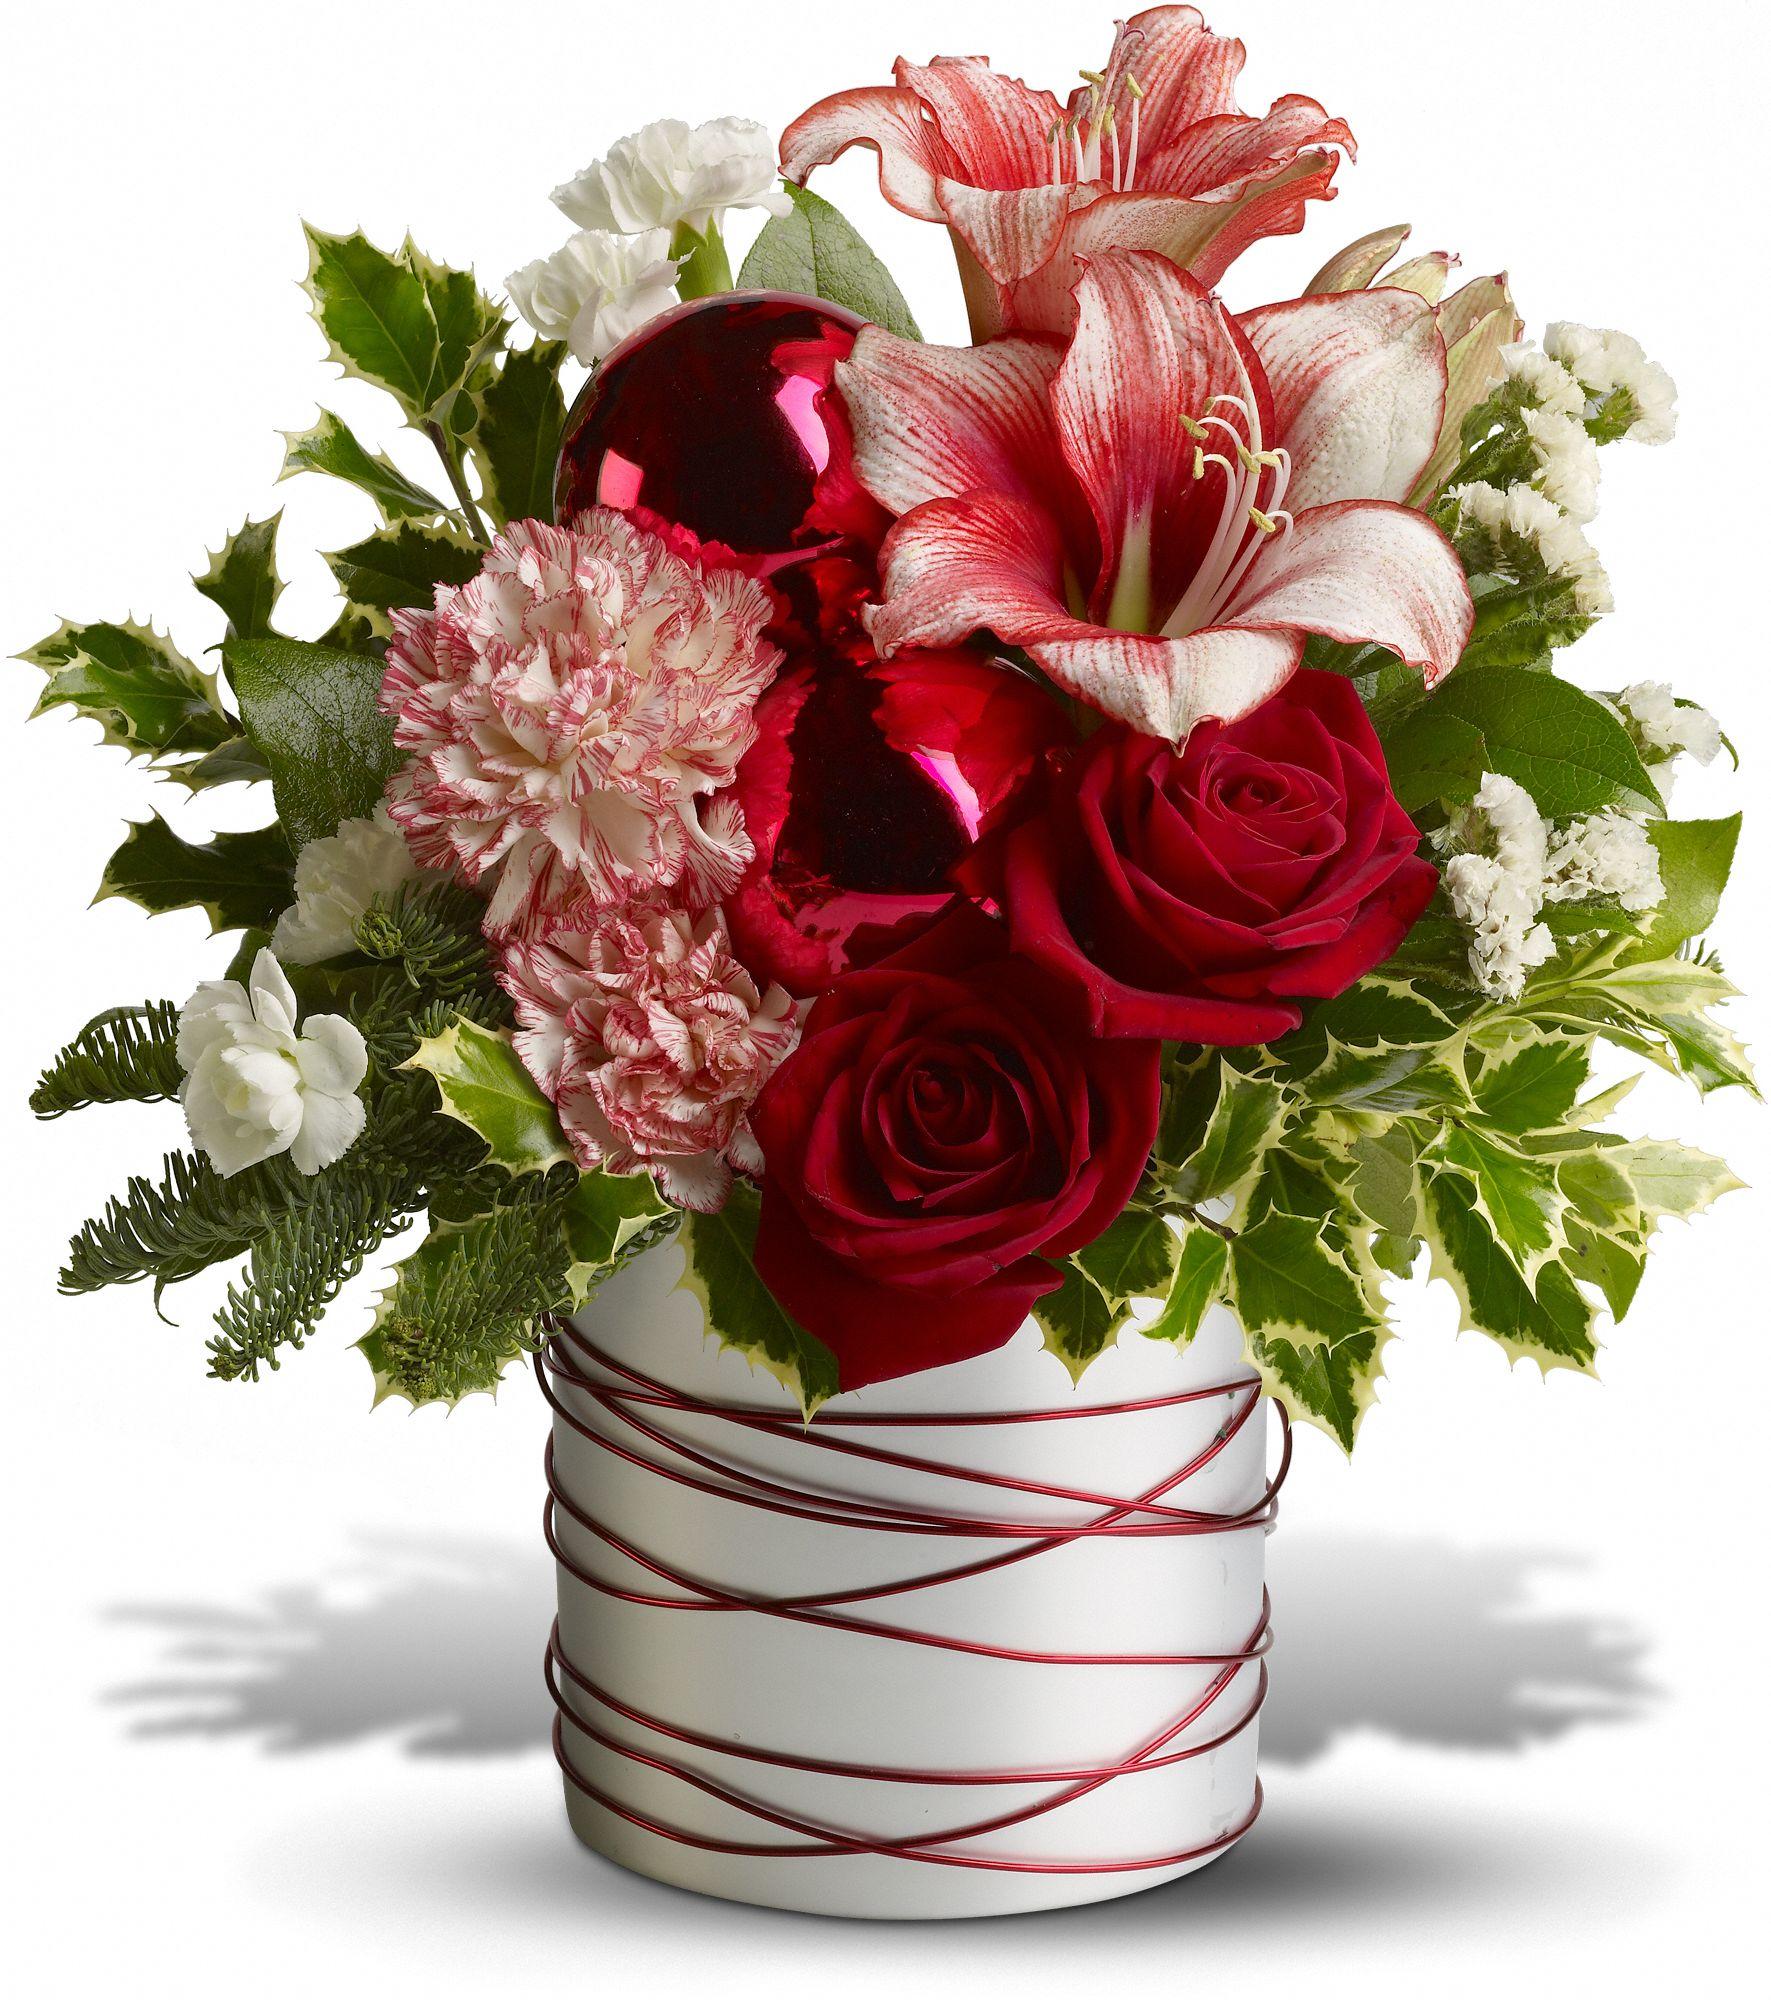 Winter Bouquet: Order Flowers: 5 Wonderful Winter Flower Bouquets With